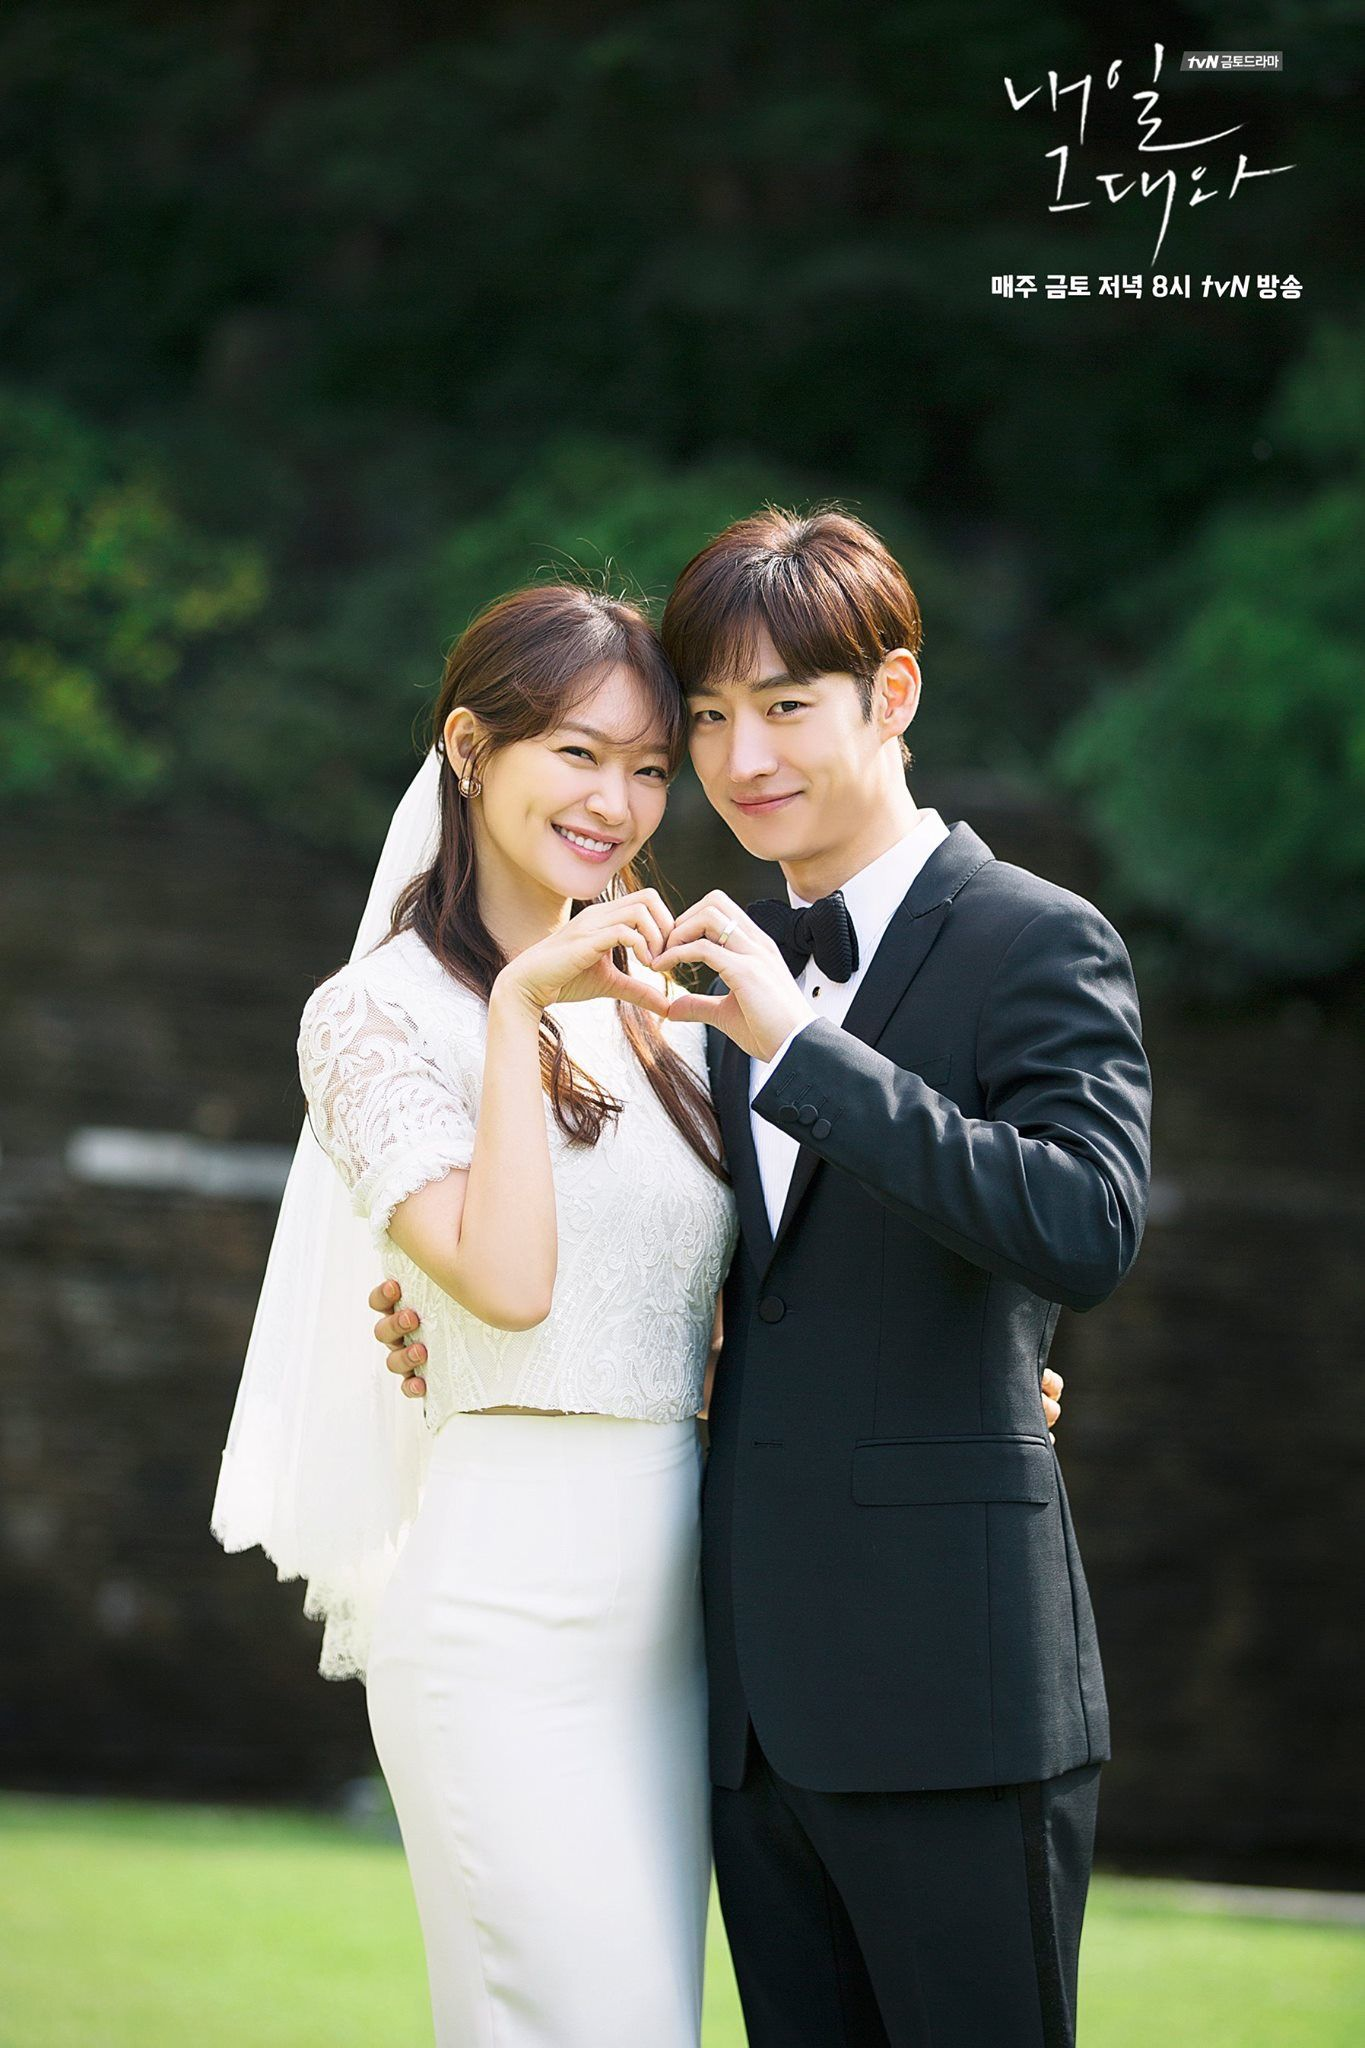 Tomorrow With You Drama Pre Wedding Photos Tomorrow With You Tomorrow With You Kdrama Korean Tv Shows